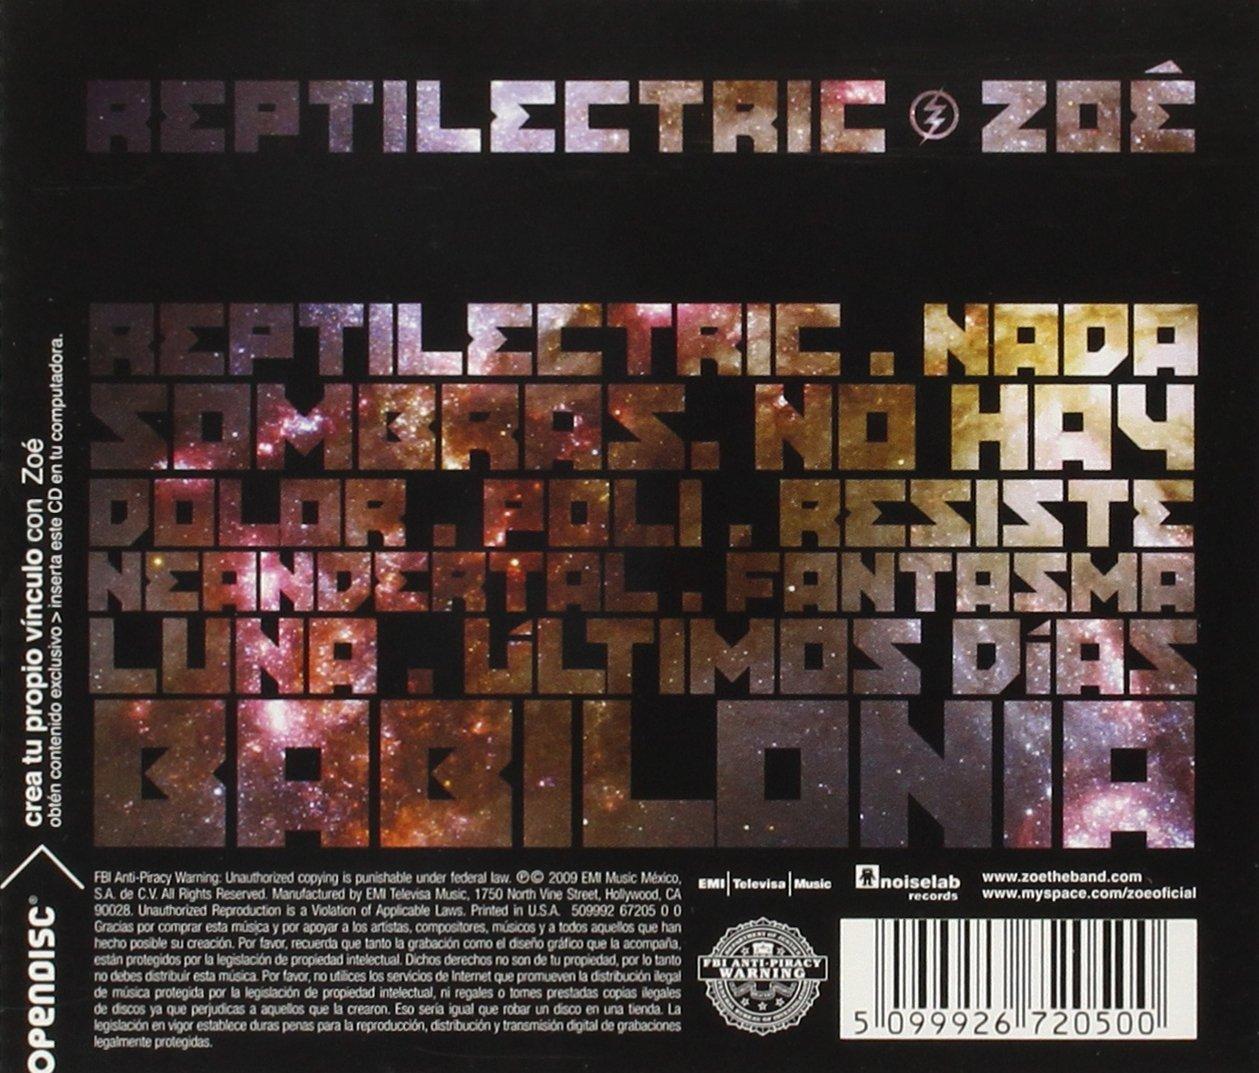 zoe reptilectric album